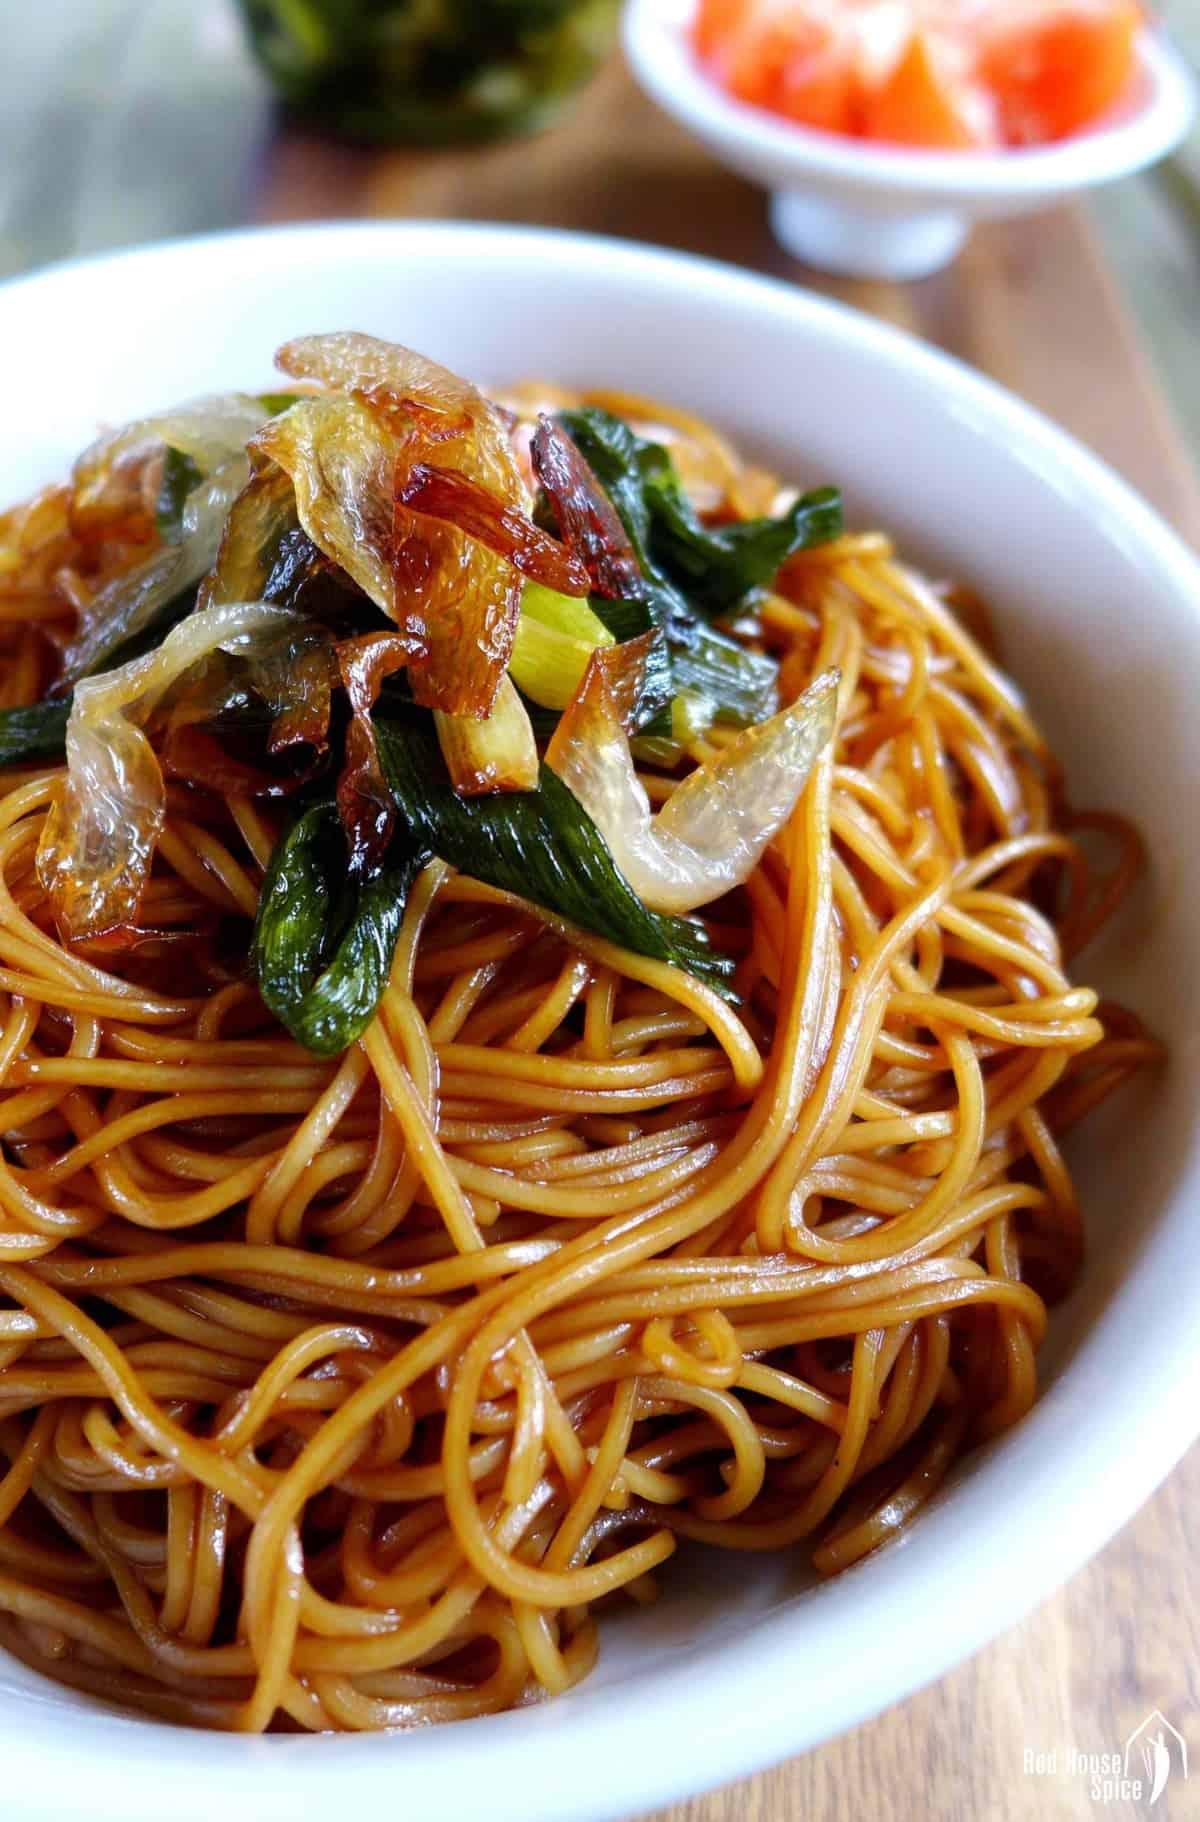 Shanghai Scallion oil noodles in a bowl